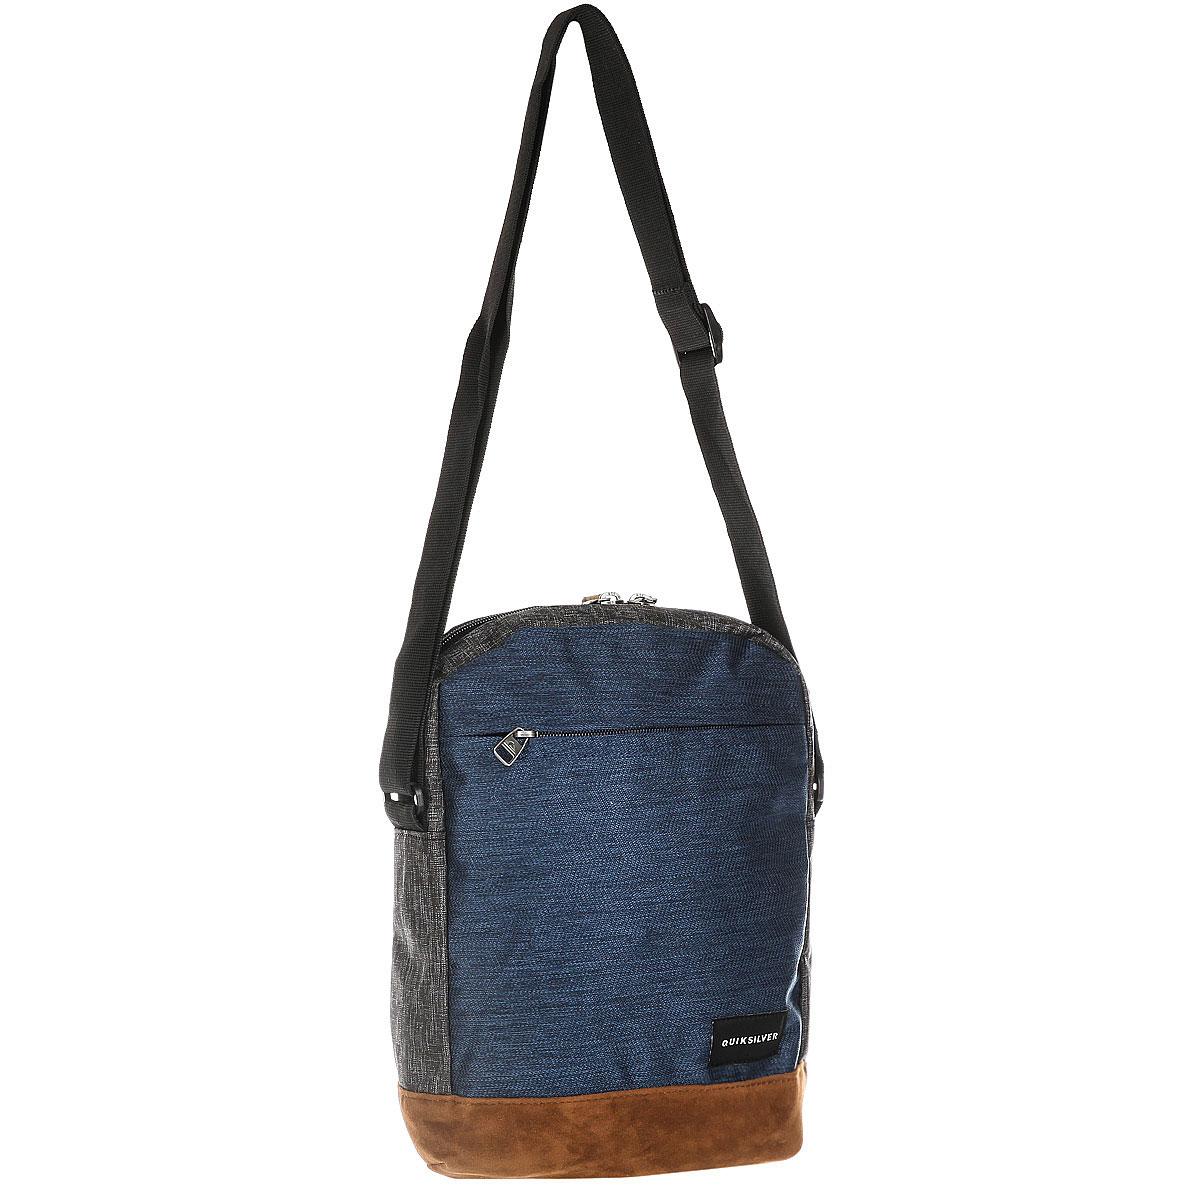 7f639d580bf5 Купить сумку через плечо Quiksilver Magicallxl Medieval Blue  (EQYBA03080-BTE0) в интернет-магазине Proskater.by